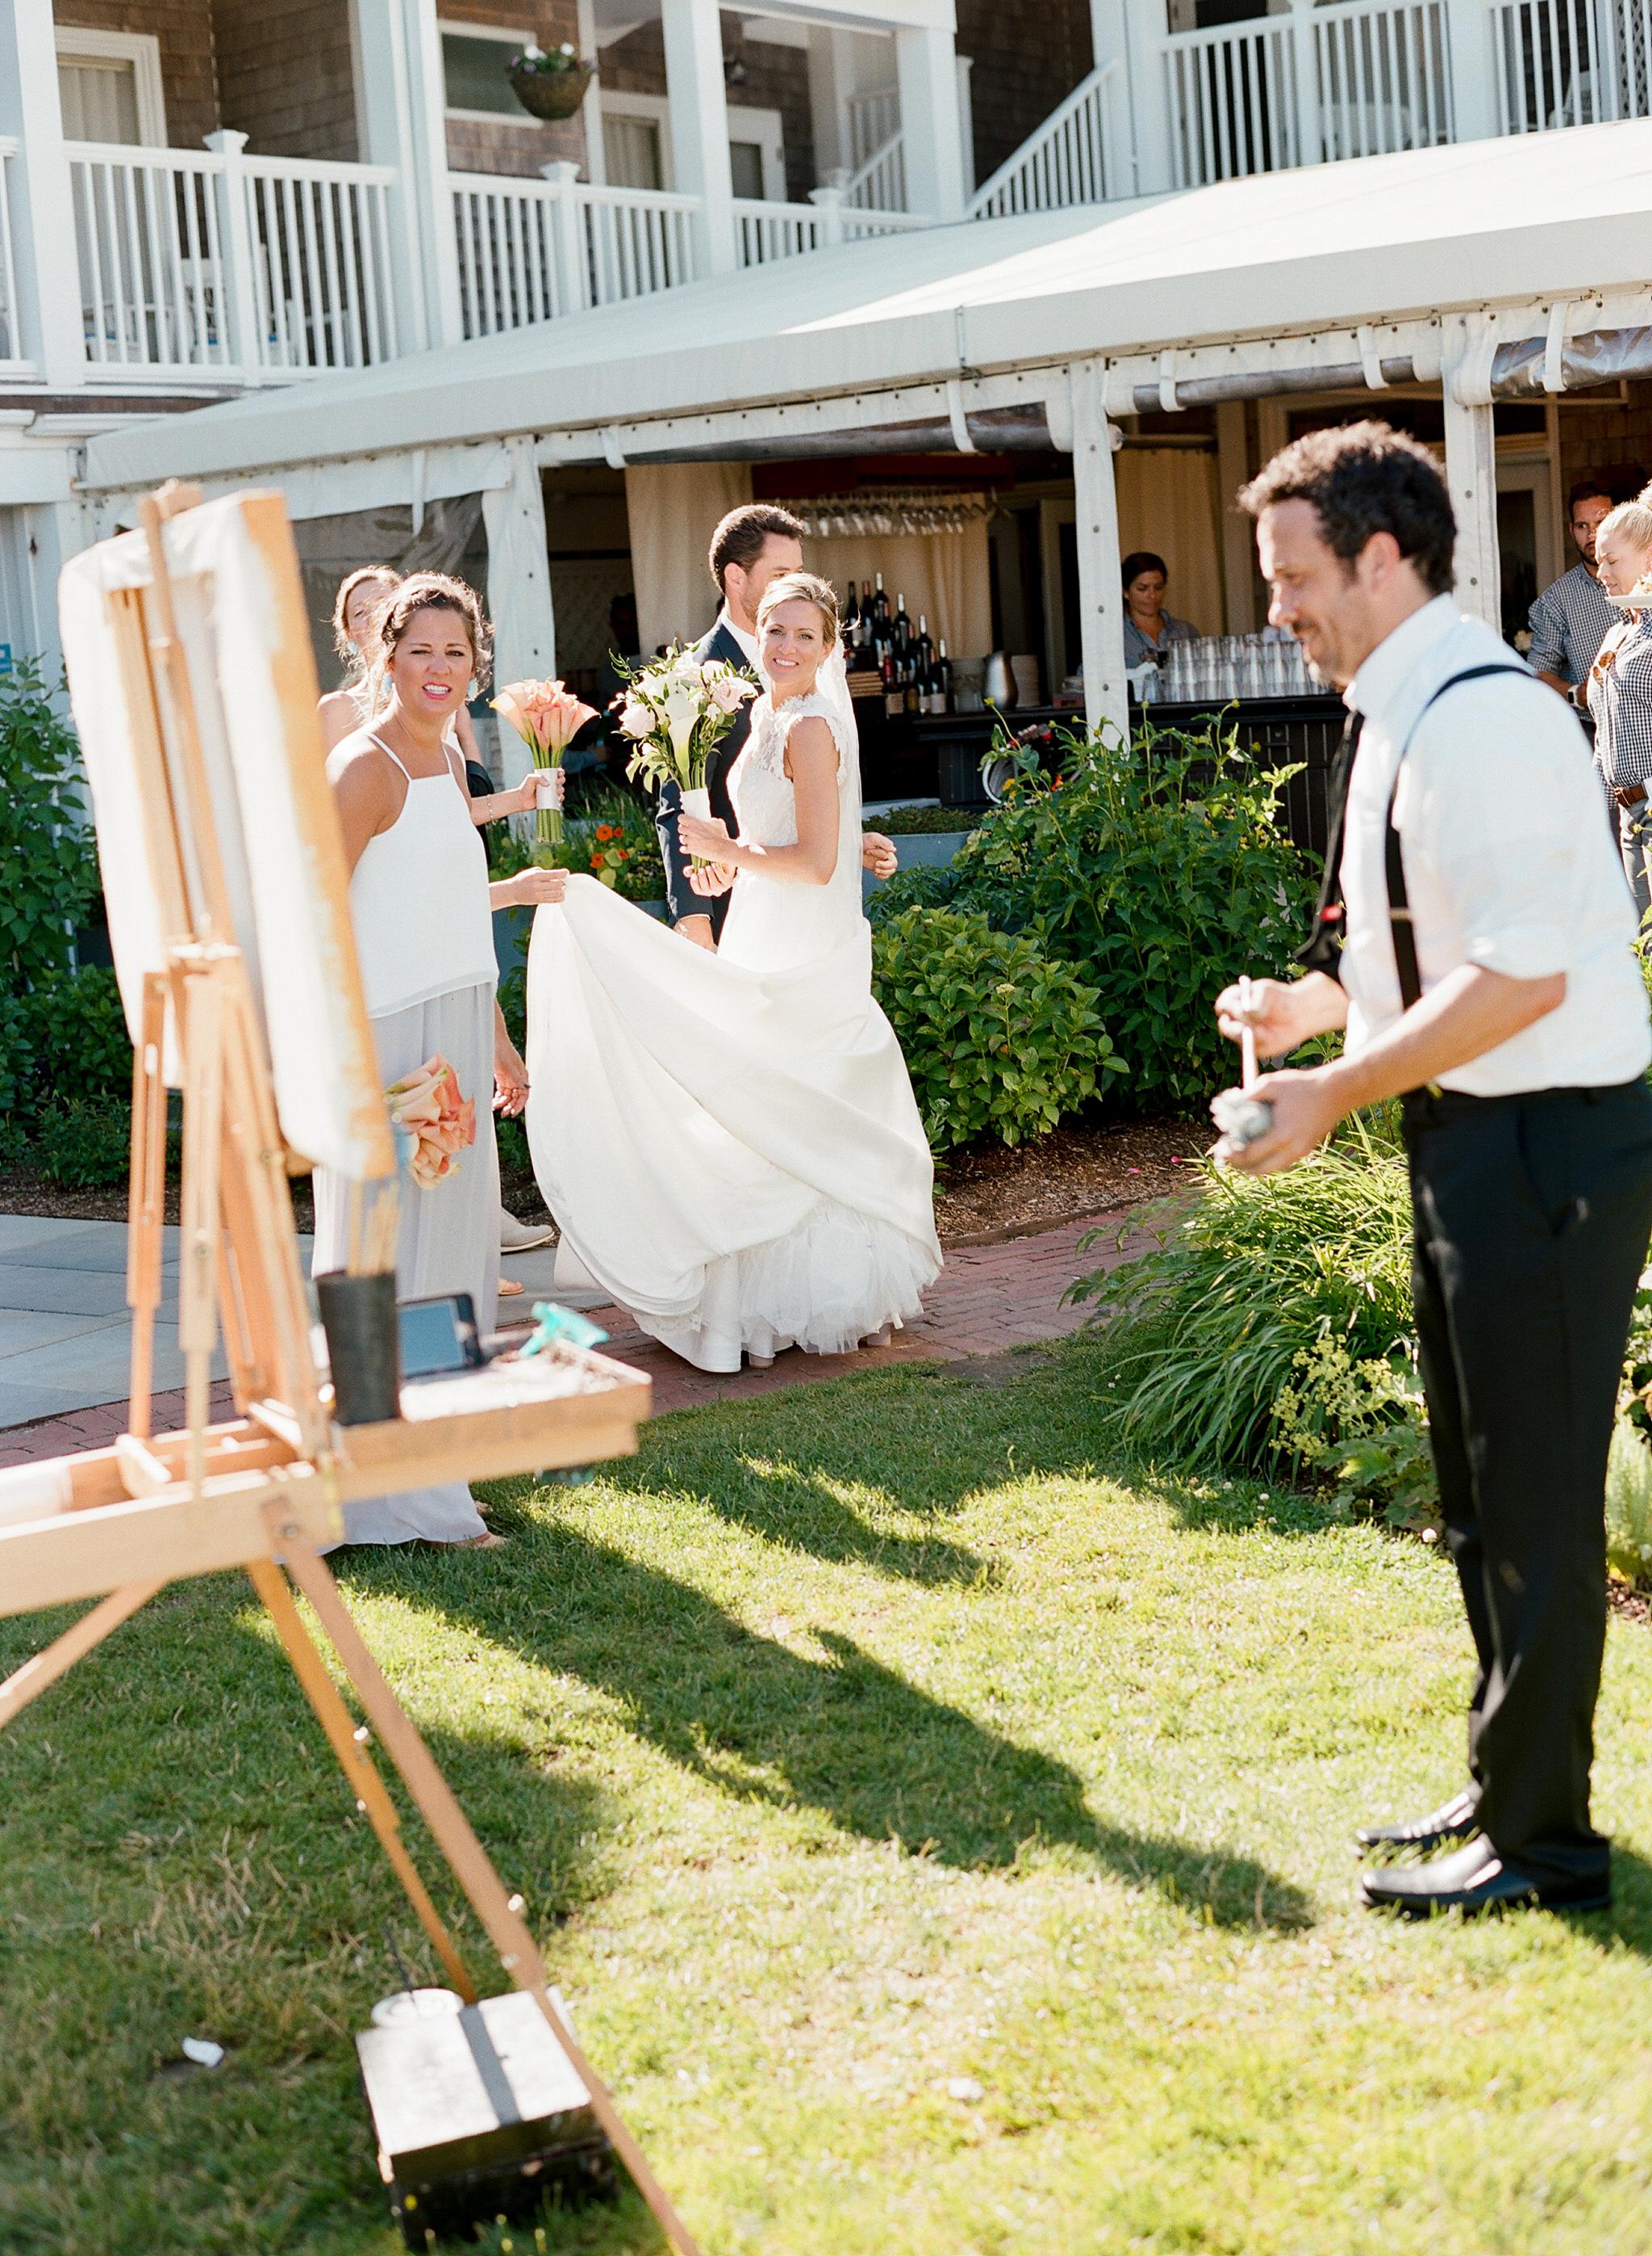 nantucket-marthas-vineyard-live-wedding-painter-ben-keys-wed-on-canvas